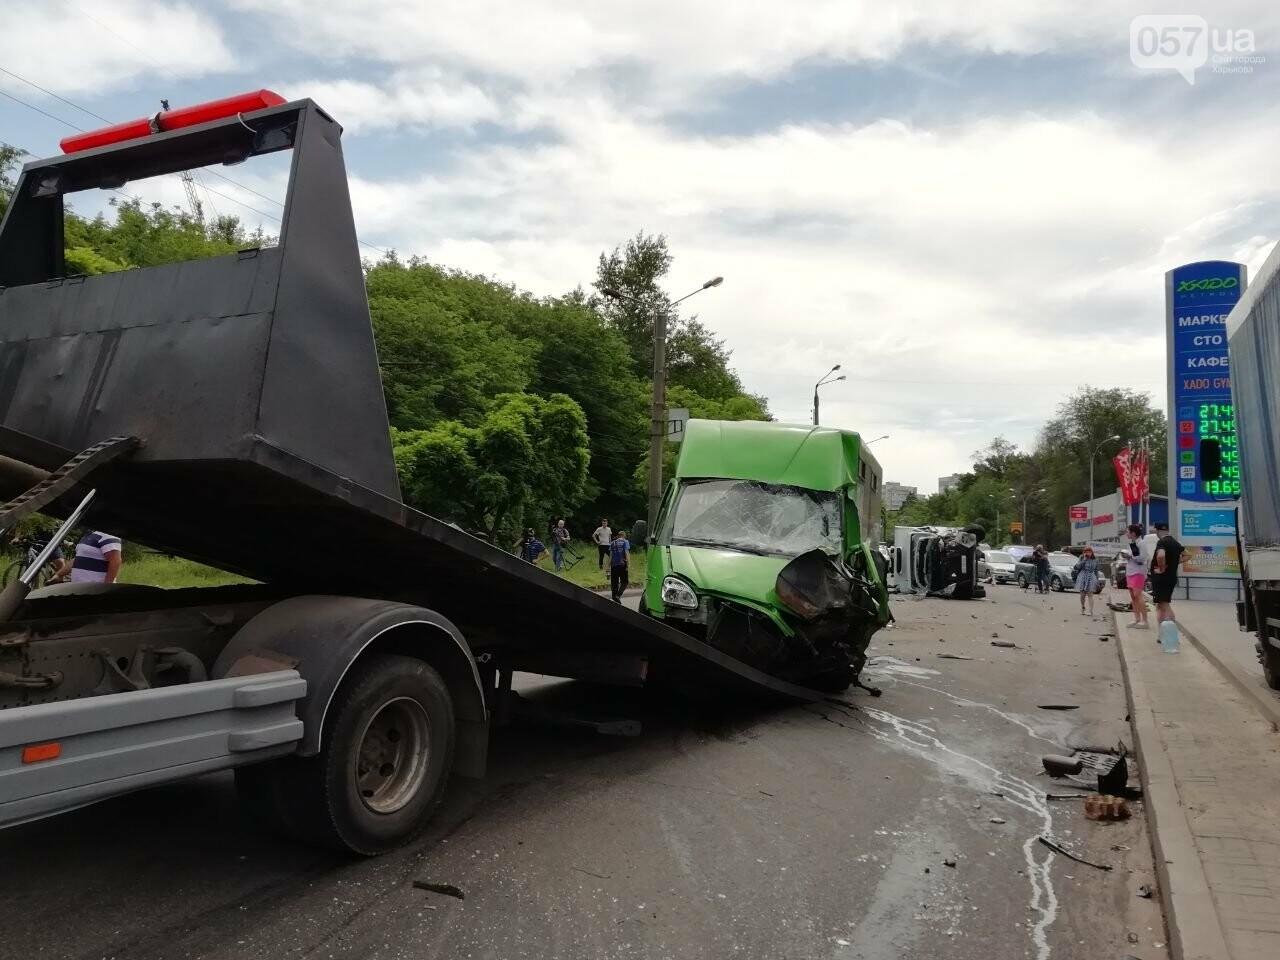 «Все сидели в крови»: подробности аварии на проспекте Тракторостроителей, - ФОТО, ВИДЕО, фото-16